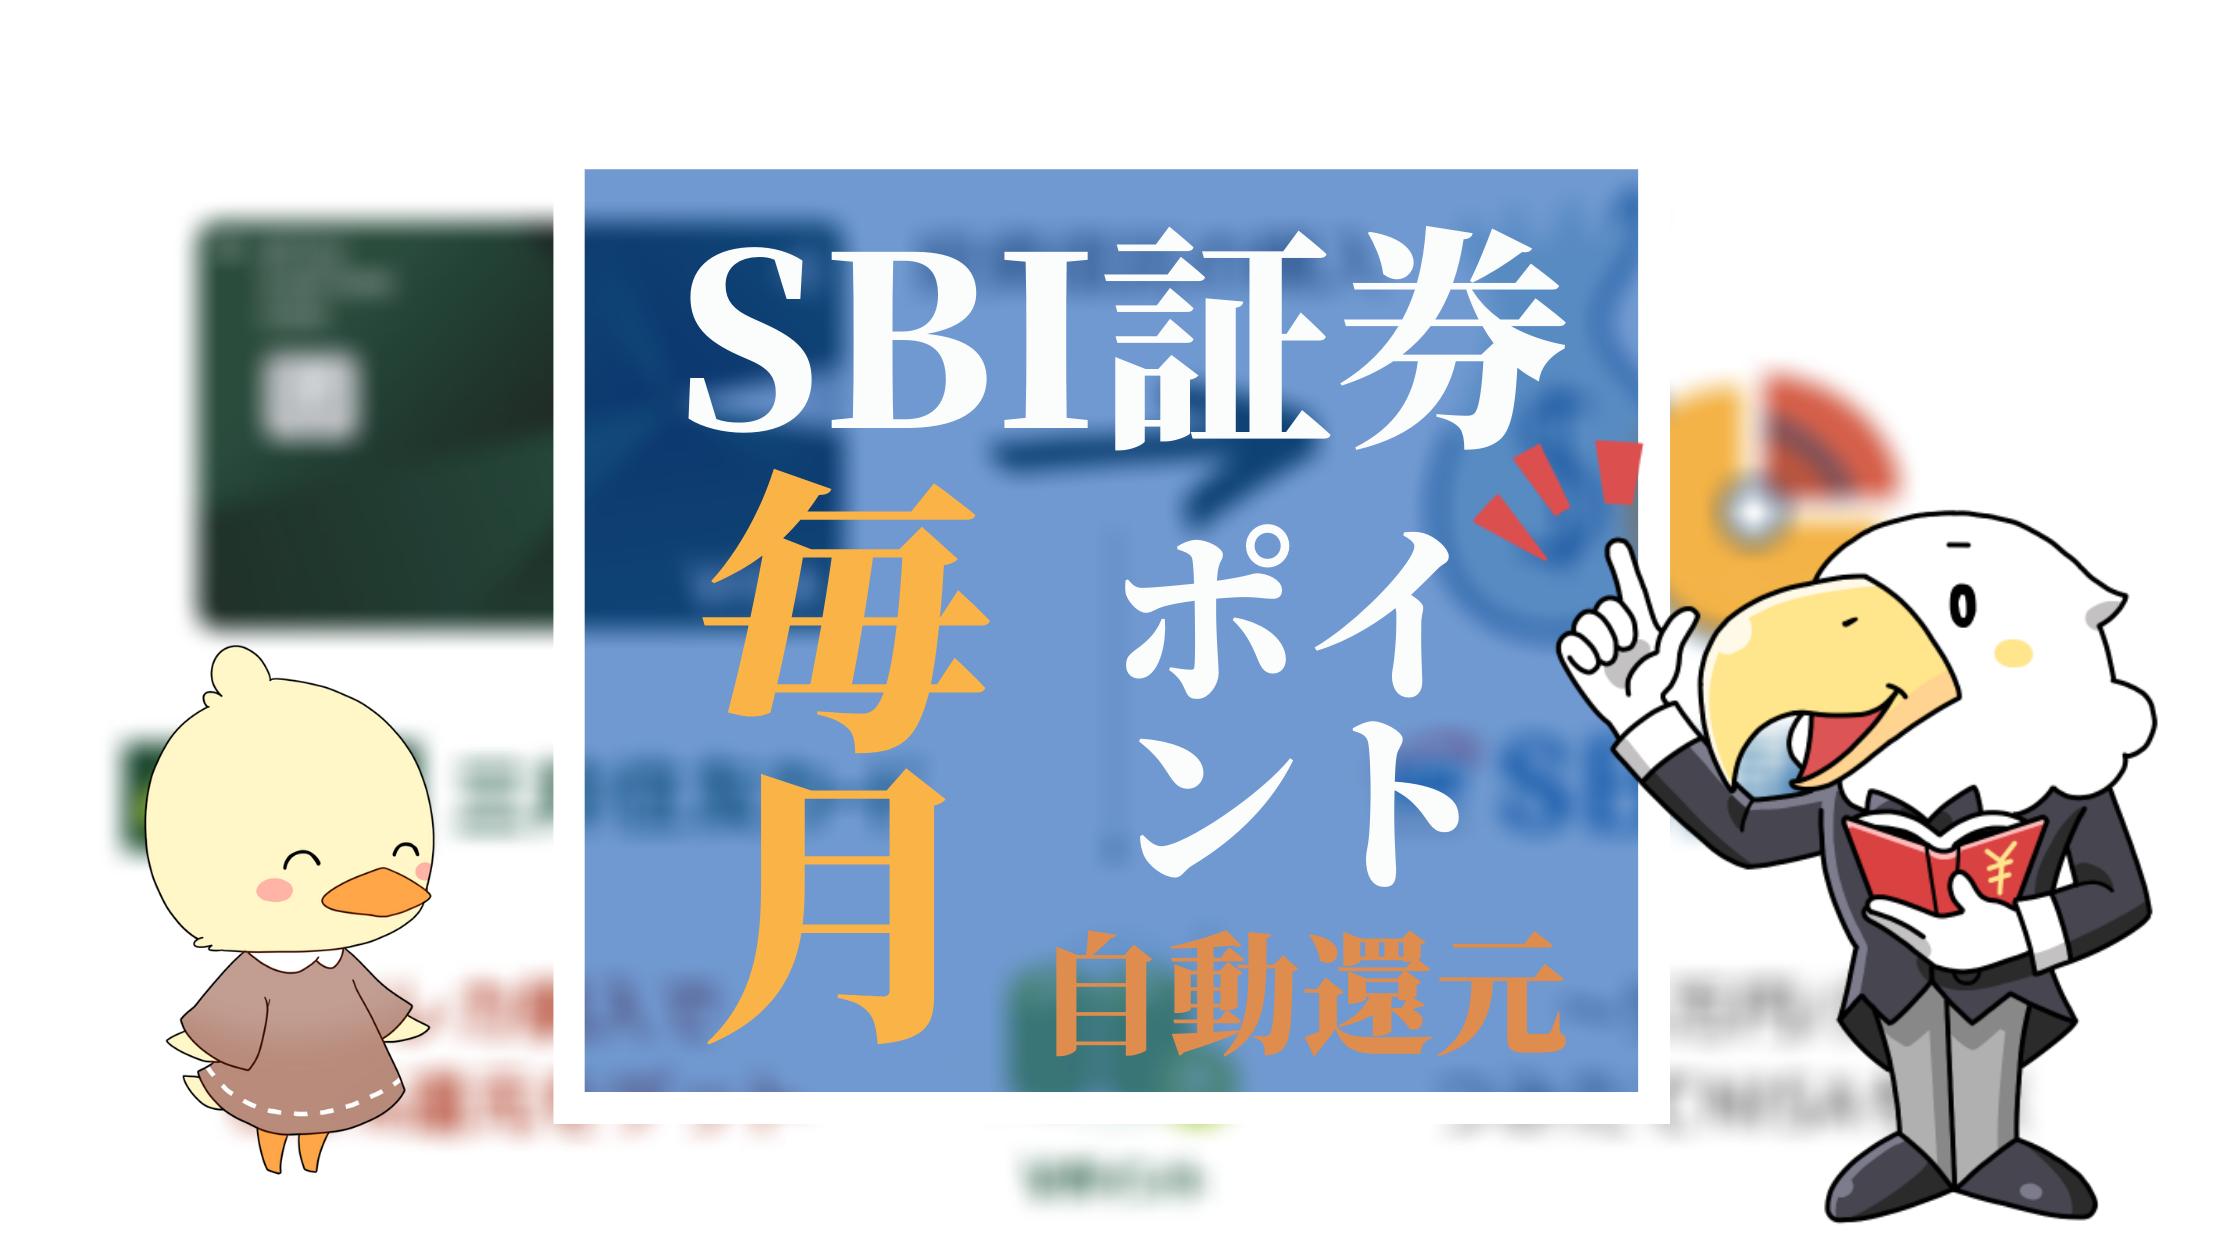 SBI証券×三井住友カード アイコン